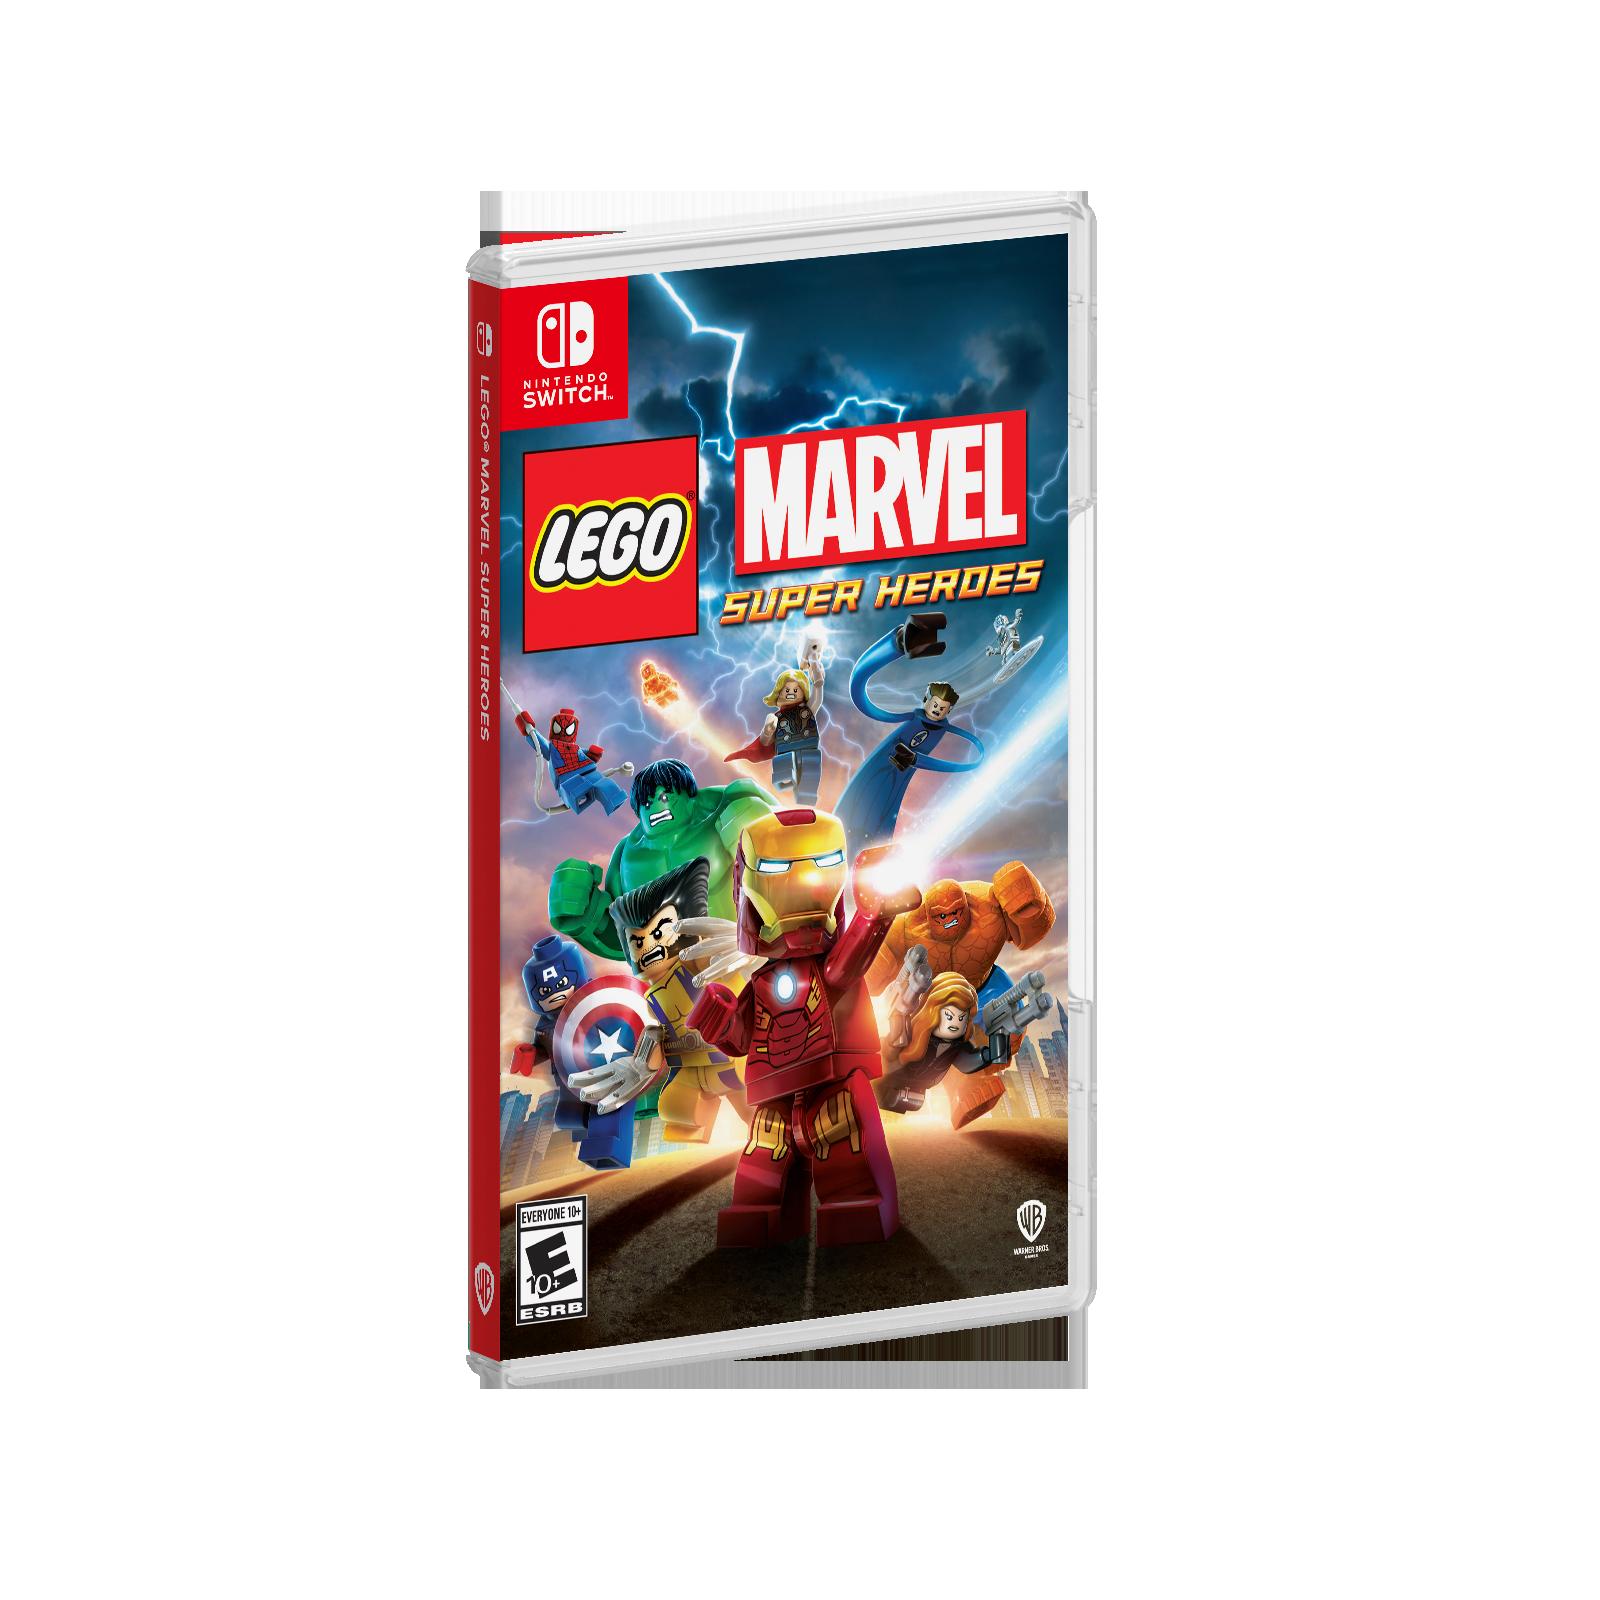 Lego Marvel, Black Widow, Loki, Spider-Man, Nick Fury, Iron Man, Wolverine, Capitán América, Hulk, Thor, Hawkeye, Deadpool, Galactus